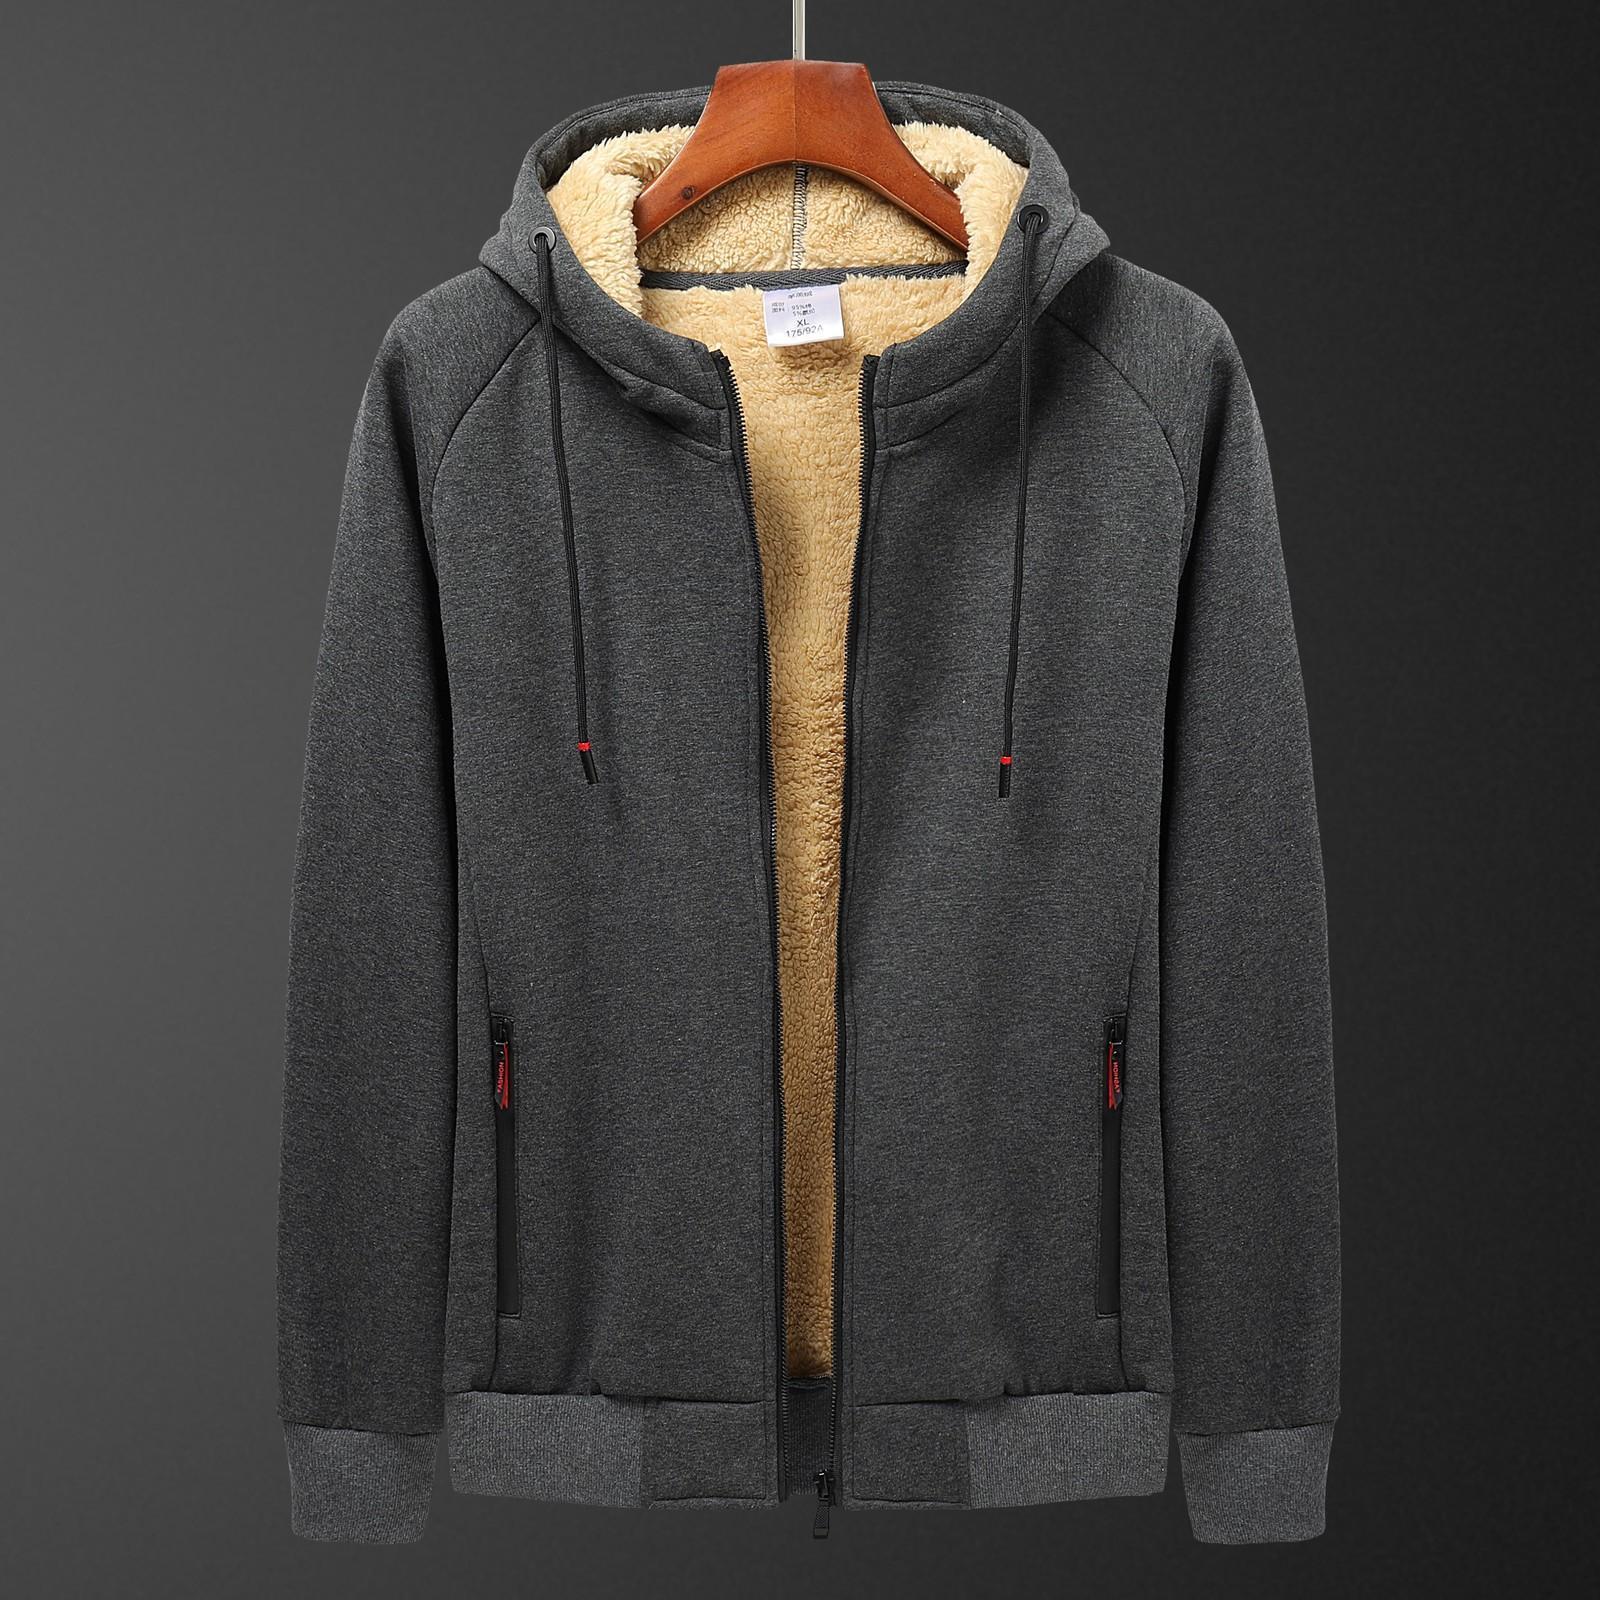 Winter Thicken Hooded cotton winter new plus cashmere men's casual lamb cashmere plus size Hoodie Plush coat L-8XL streetwear Z1208